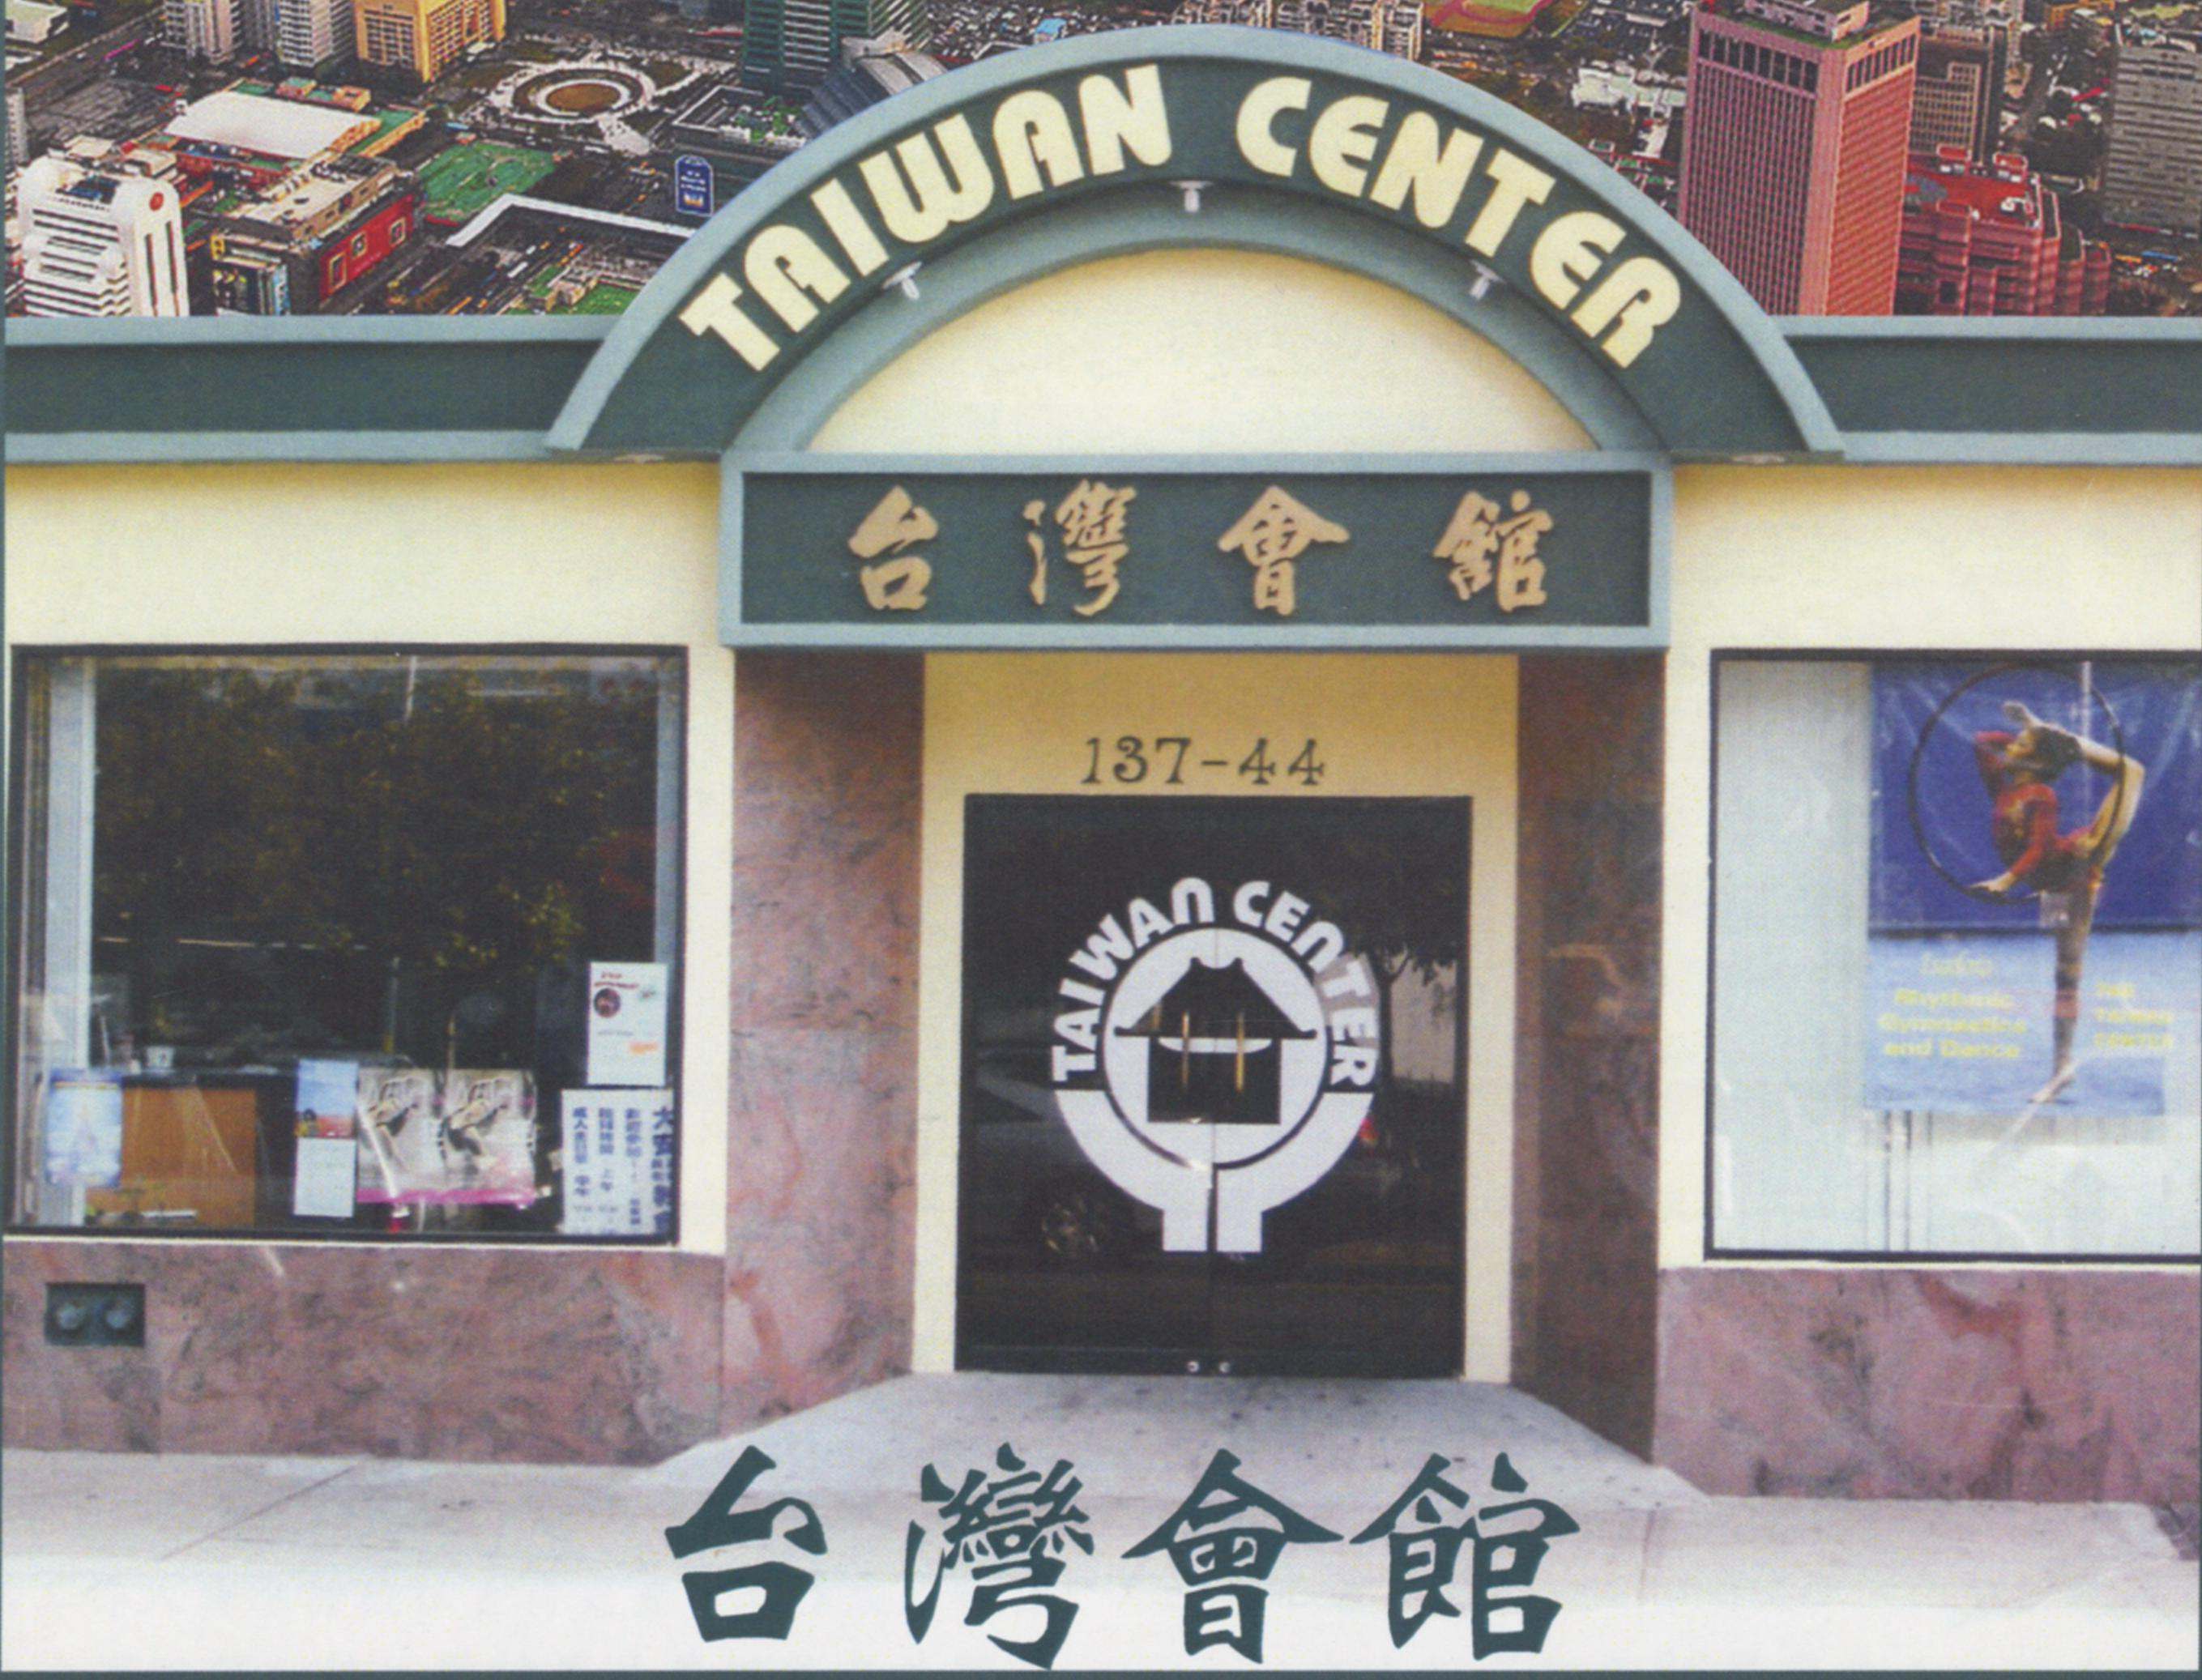 Taiwan Center/New York (紐約台灣會館)